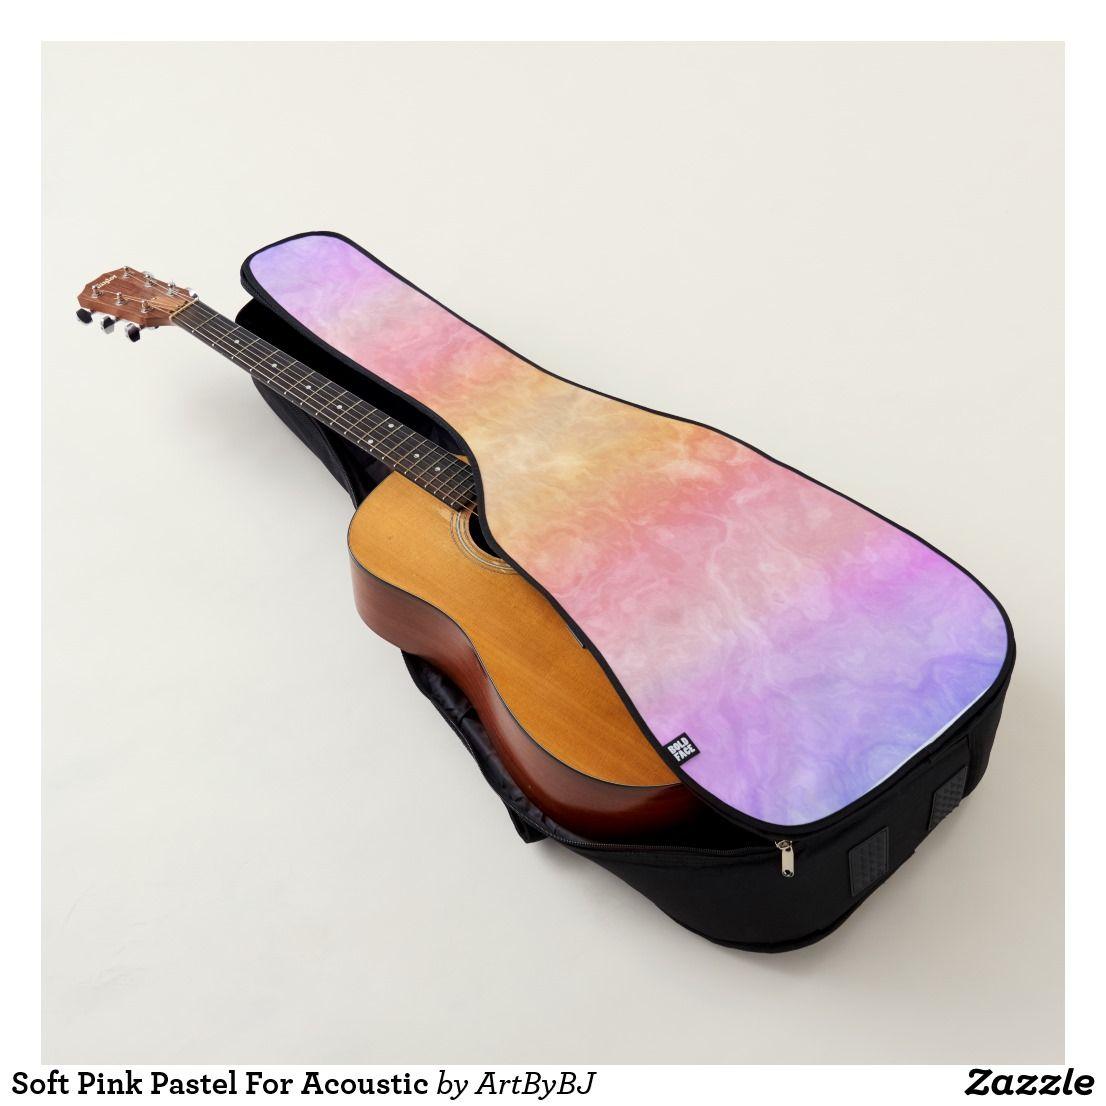 Soft Pink Pastel For Acoustic Guitar Case Zazzle Com Guitar Case Acoustic Guitar Case Guitar Bag